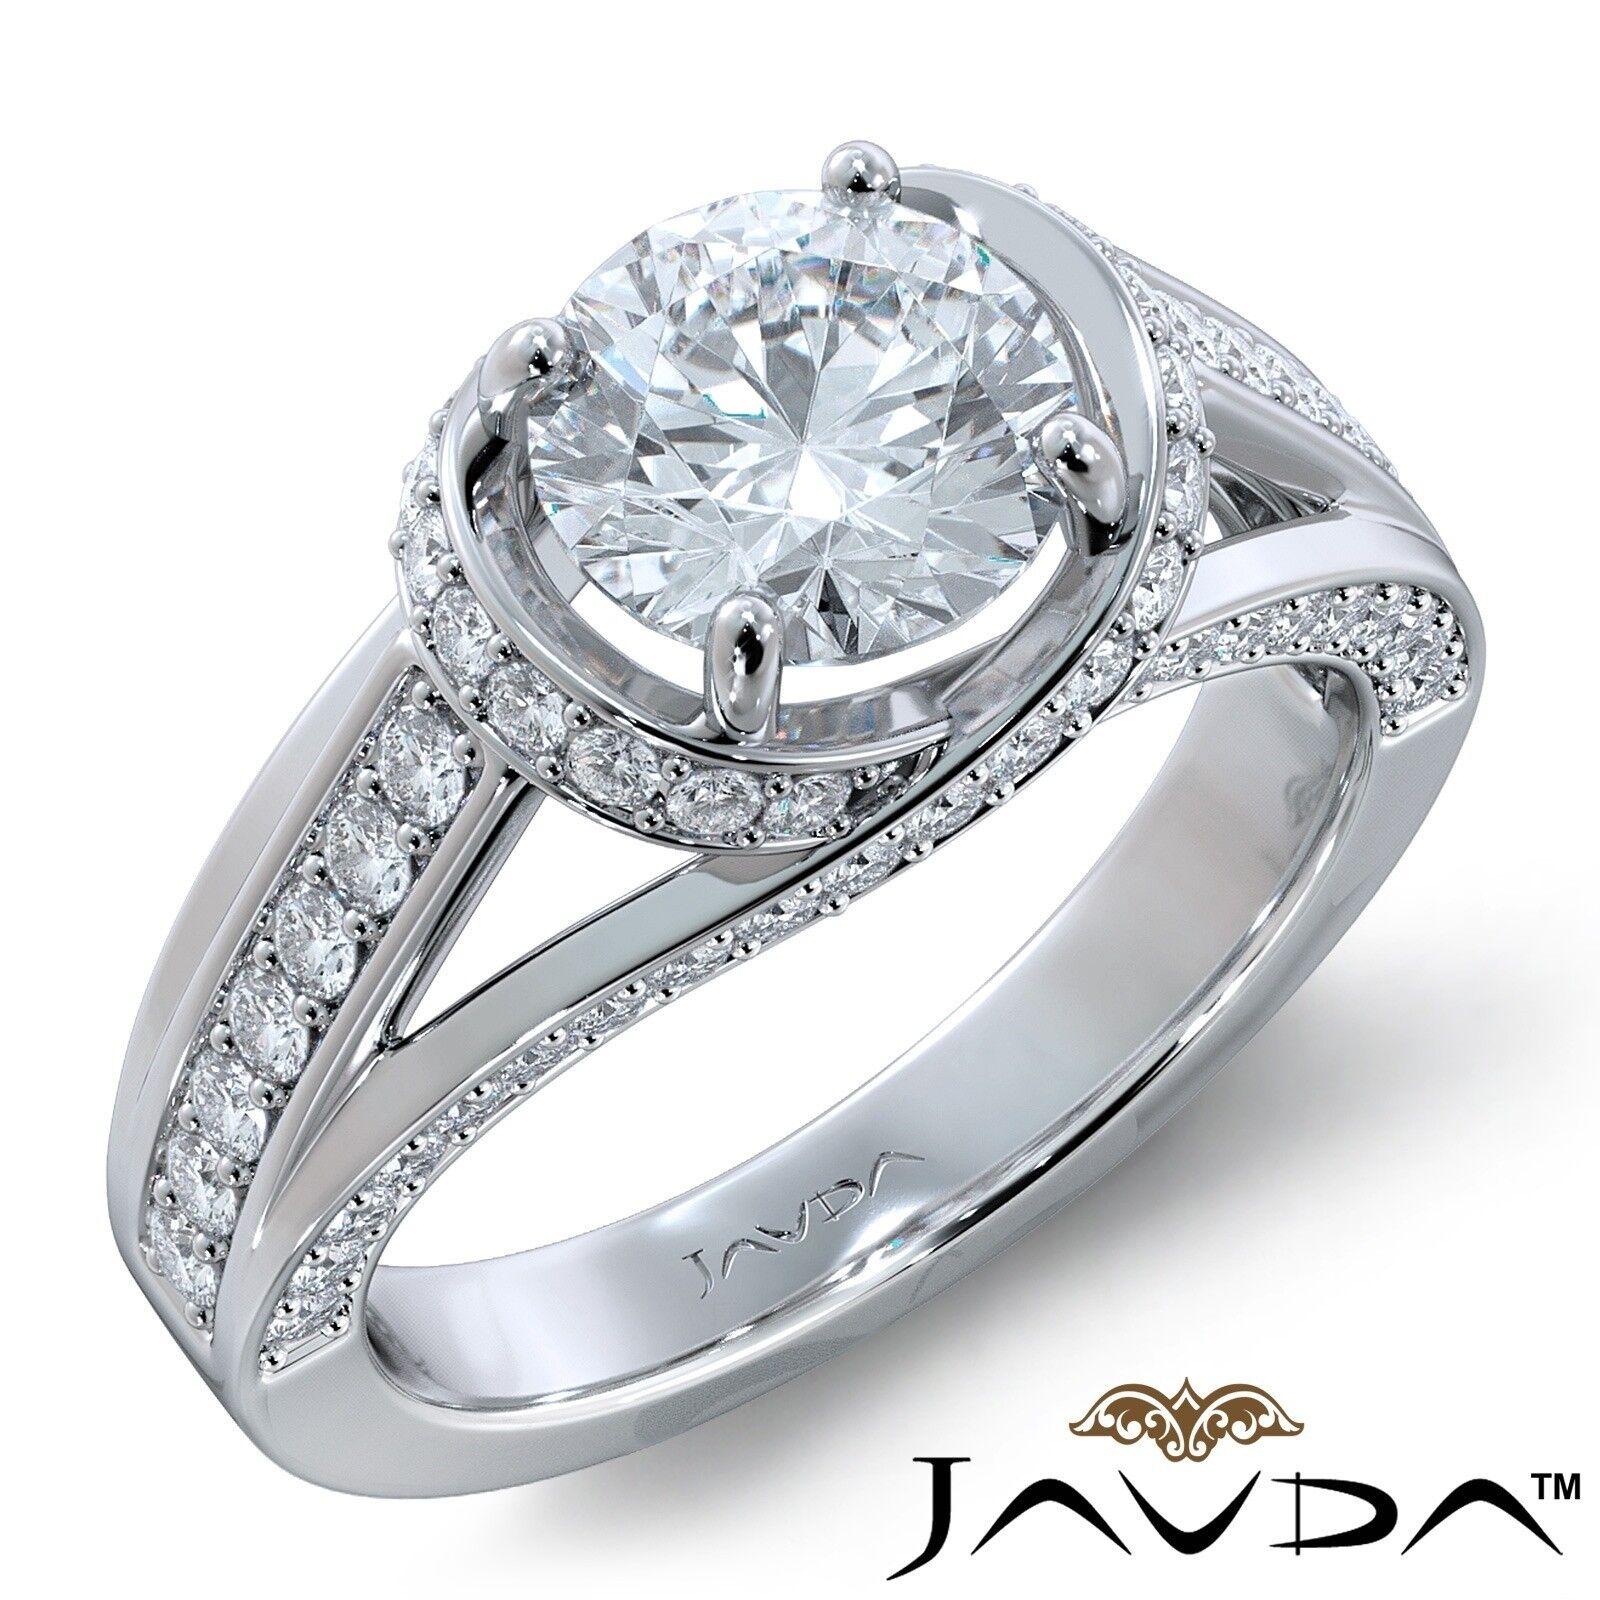 3.4ctw Knot Classic Sidestone Round Diamond Engagement Ring GIA H-VS1 White Gold